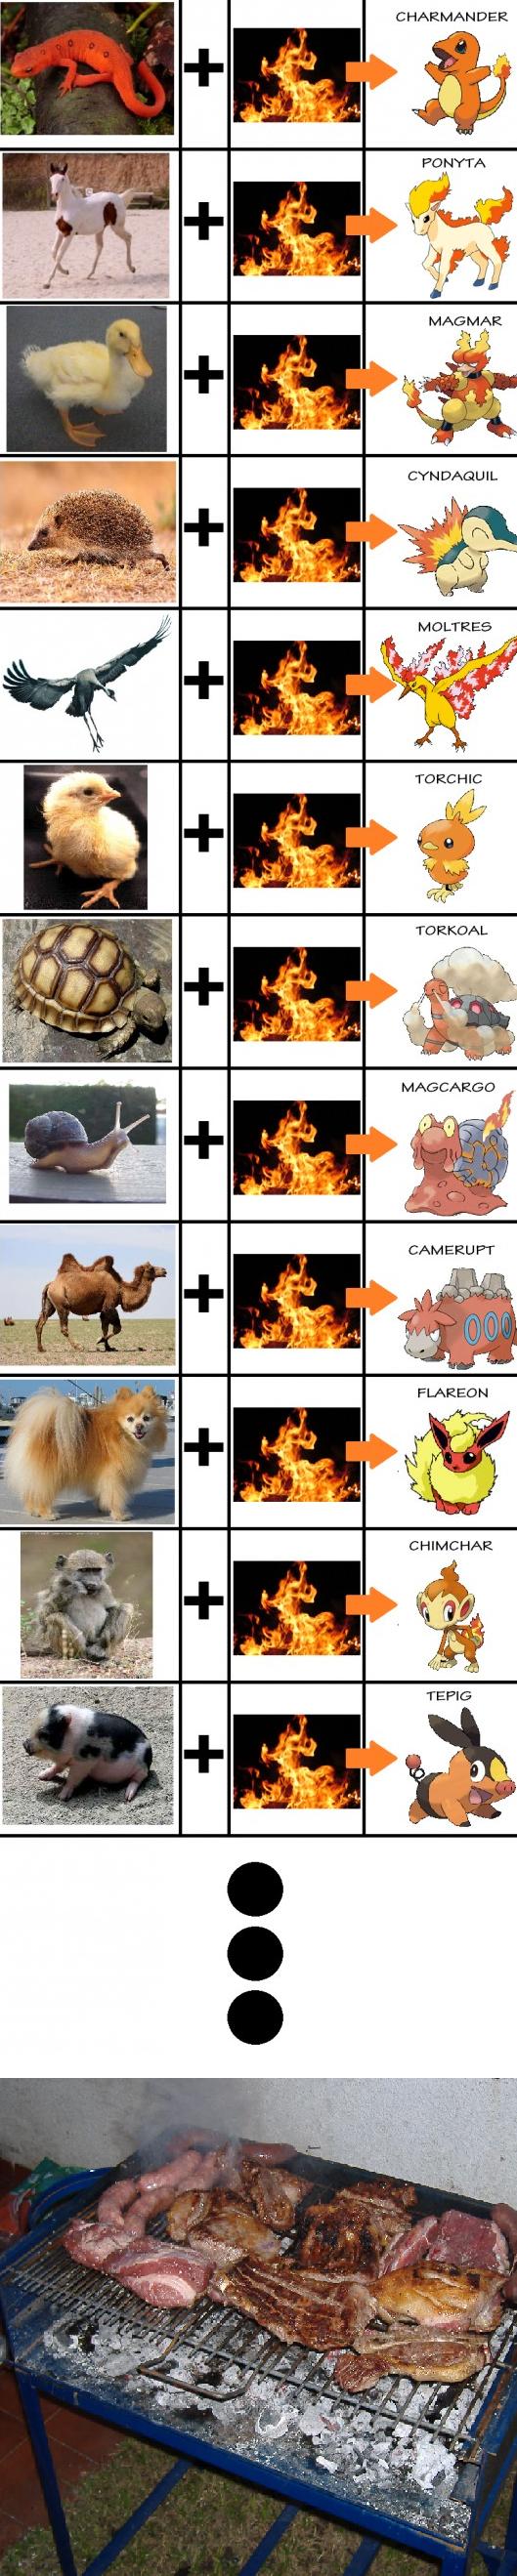 Fire pokemon. i better stay with chikorita.. OMG Pokemon are based on animals!